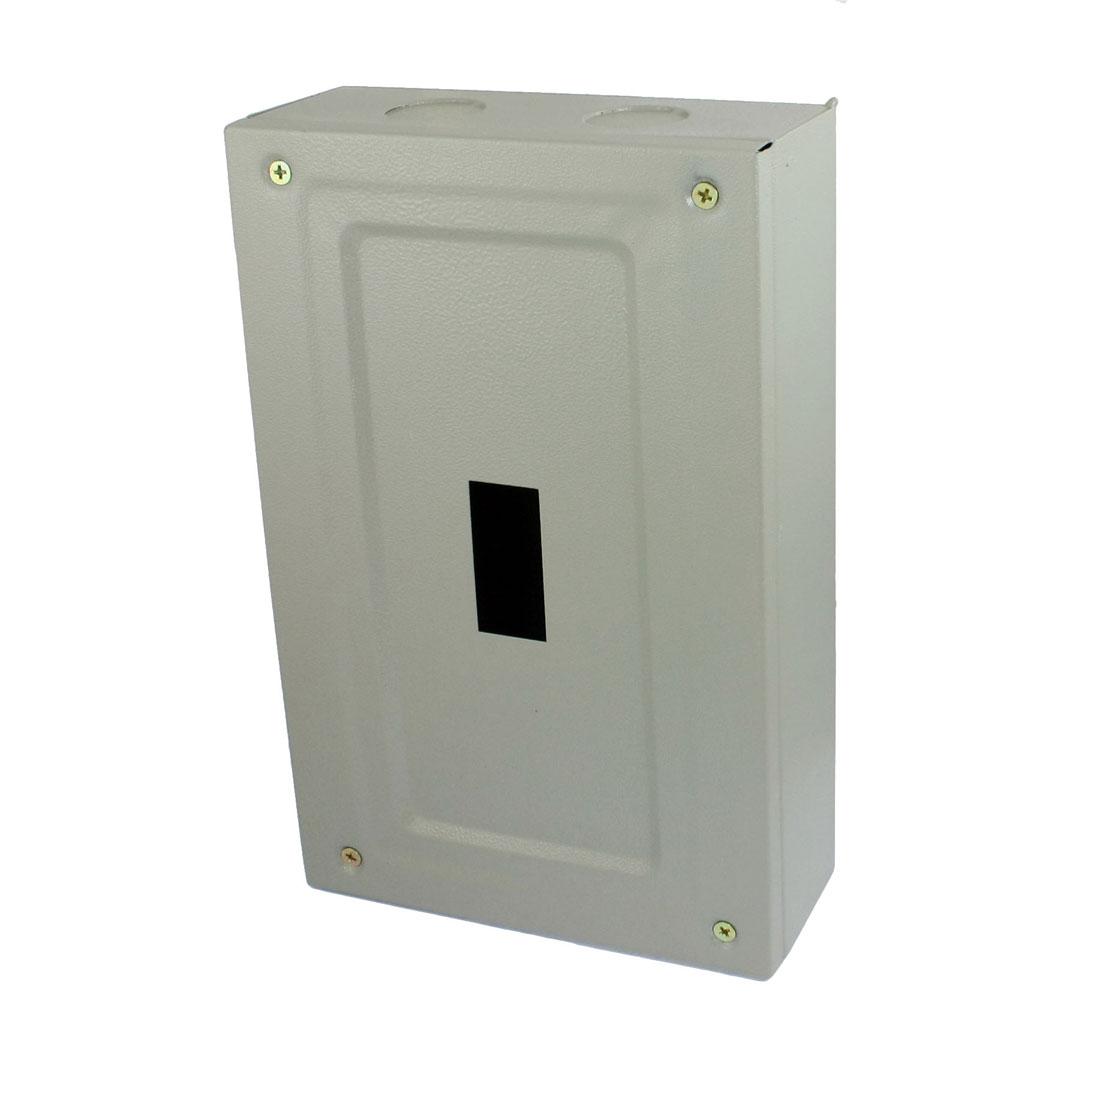 2-1-x-1-Open-Hole-Gray-Metal-Electrical-Distribution-Box